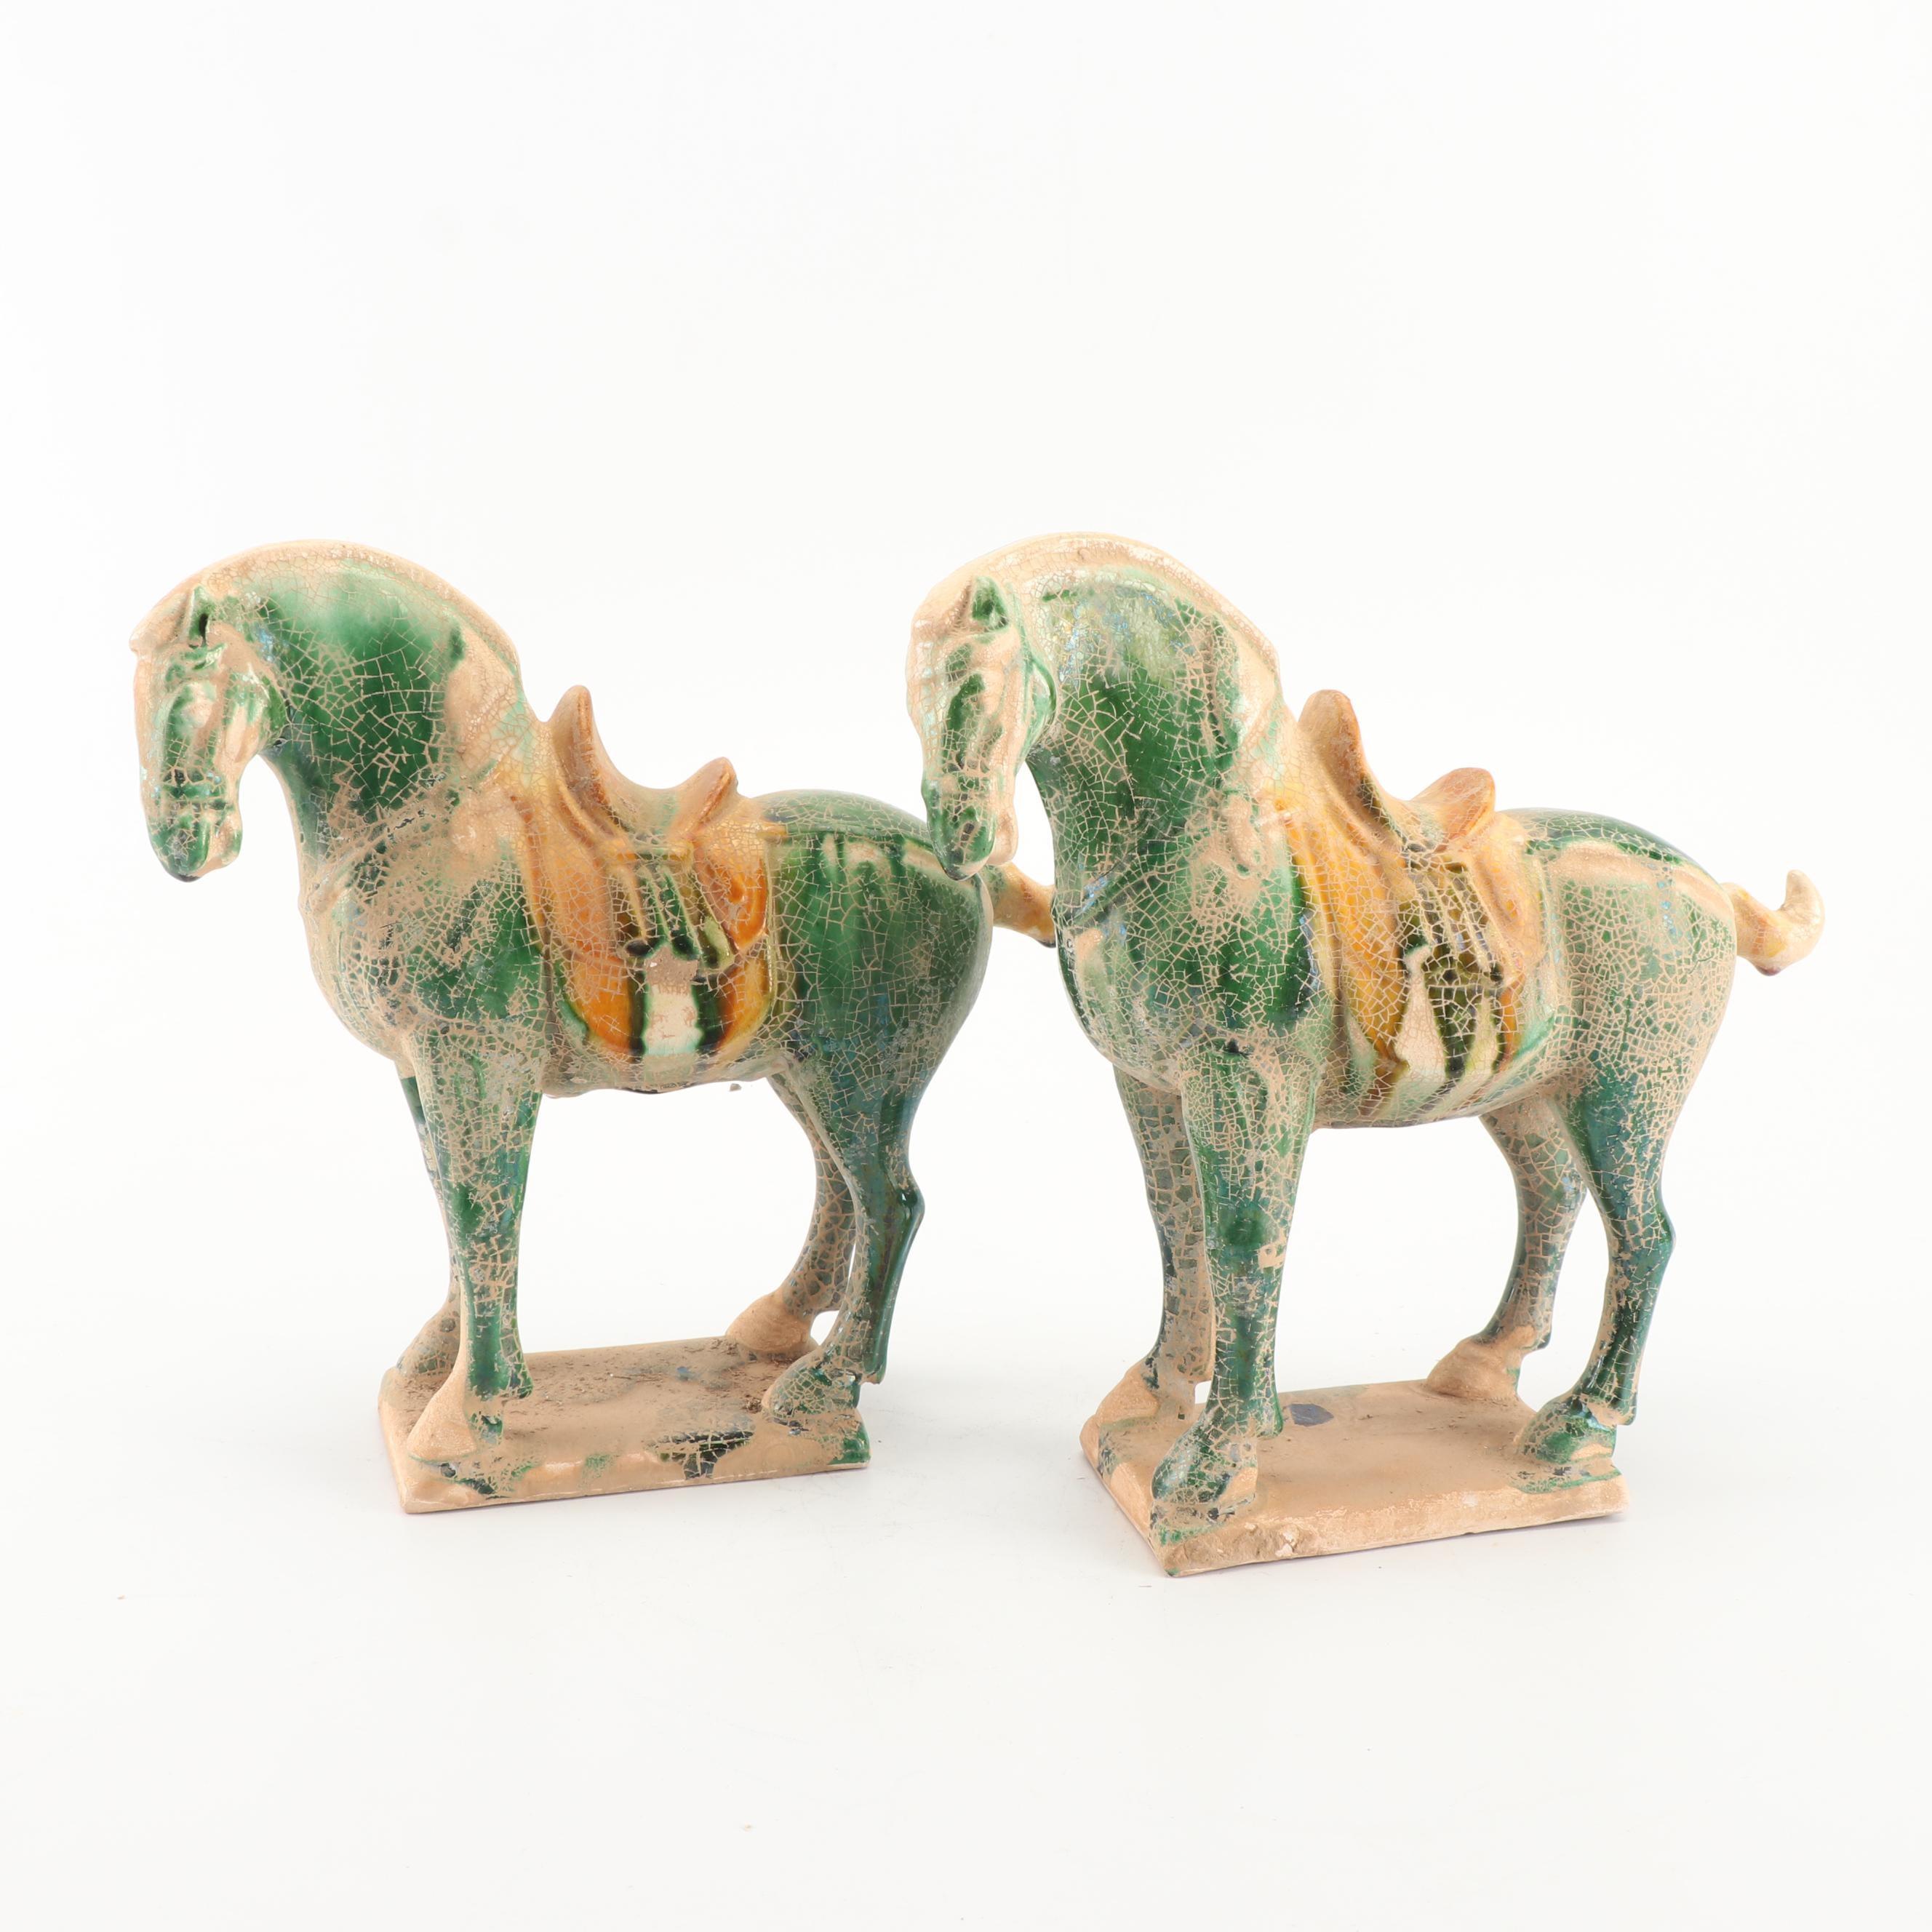 Chinese Ceramic Tang Horse Statuette Pair